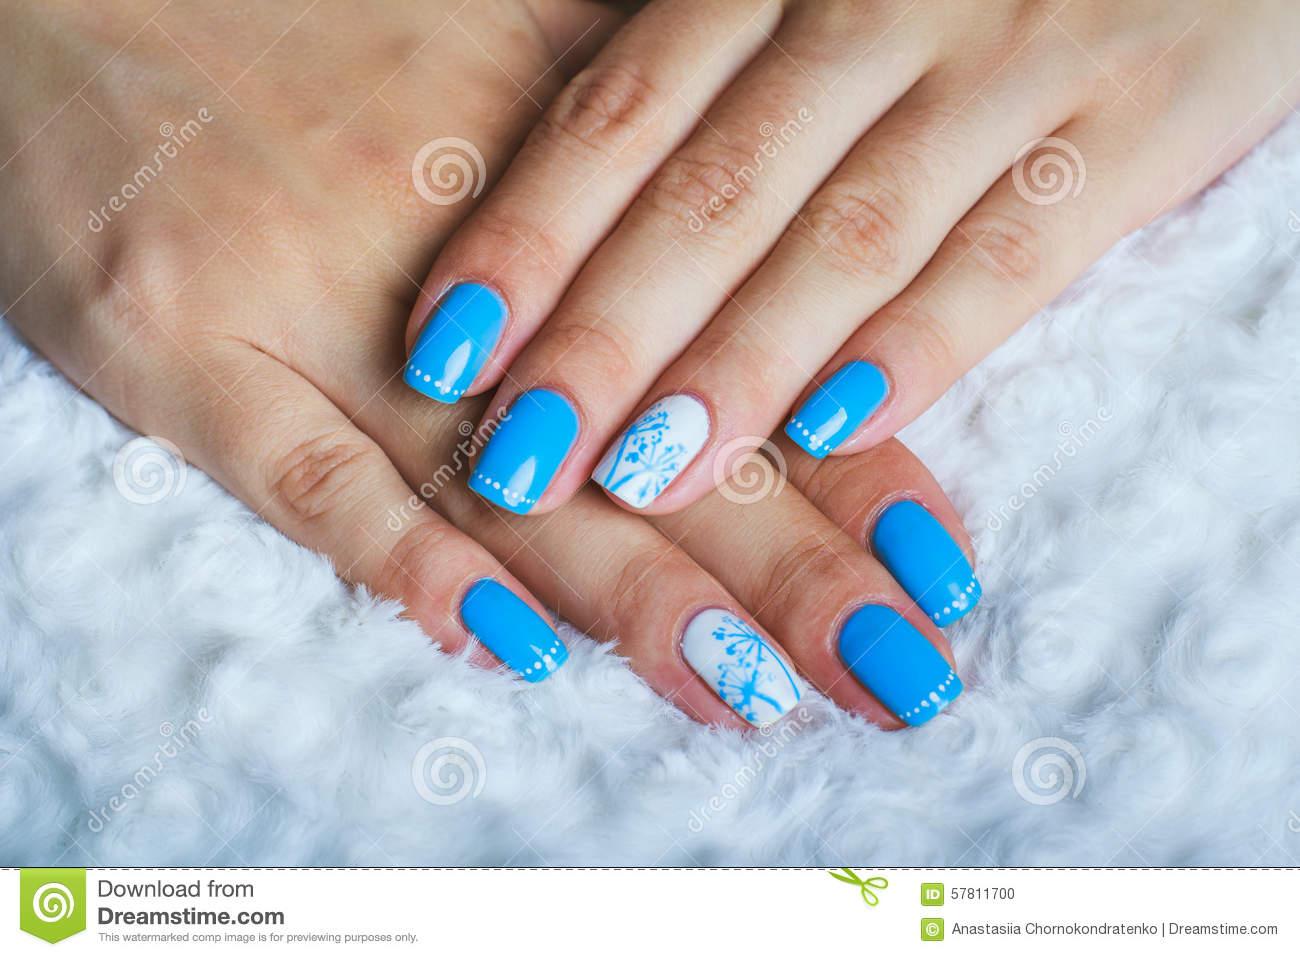 52+ Most Stylish Blue Nail Art Ideas